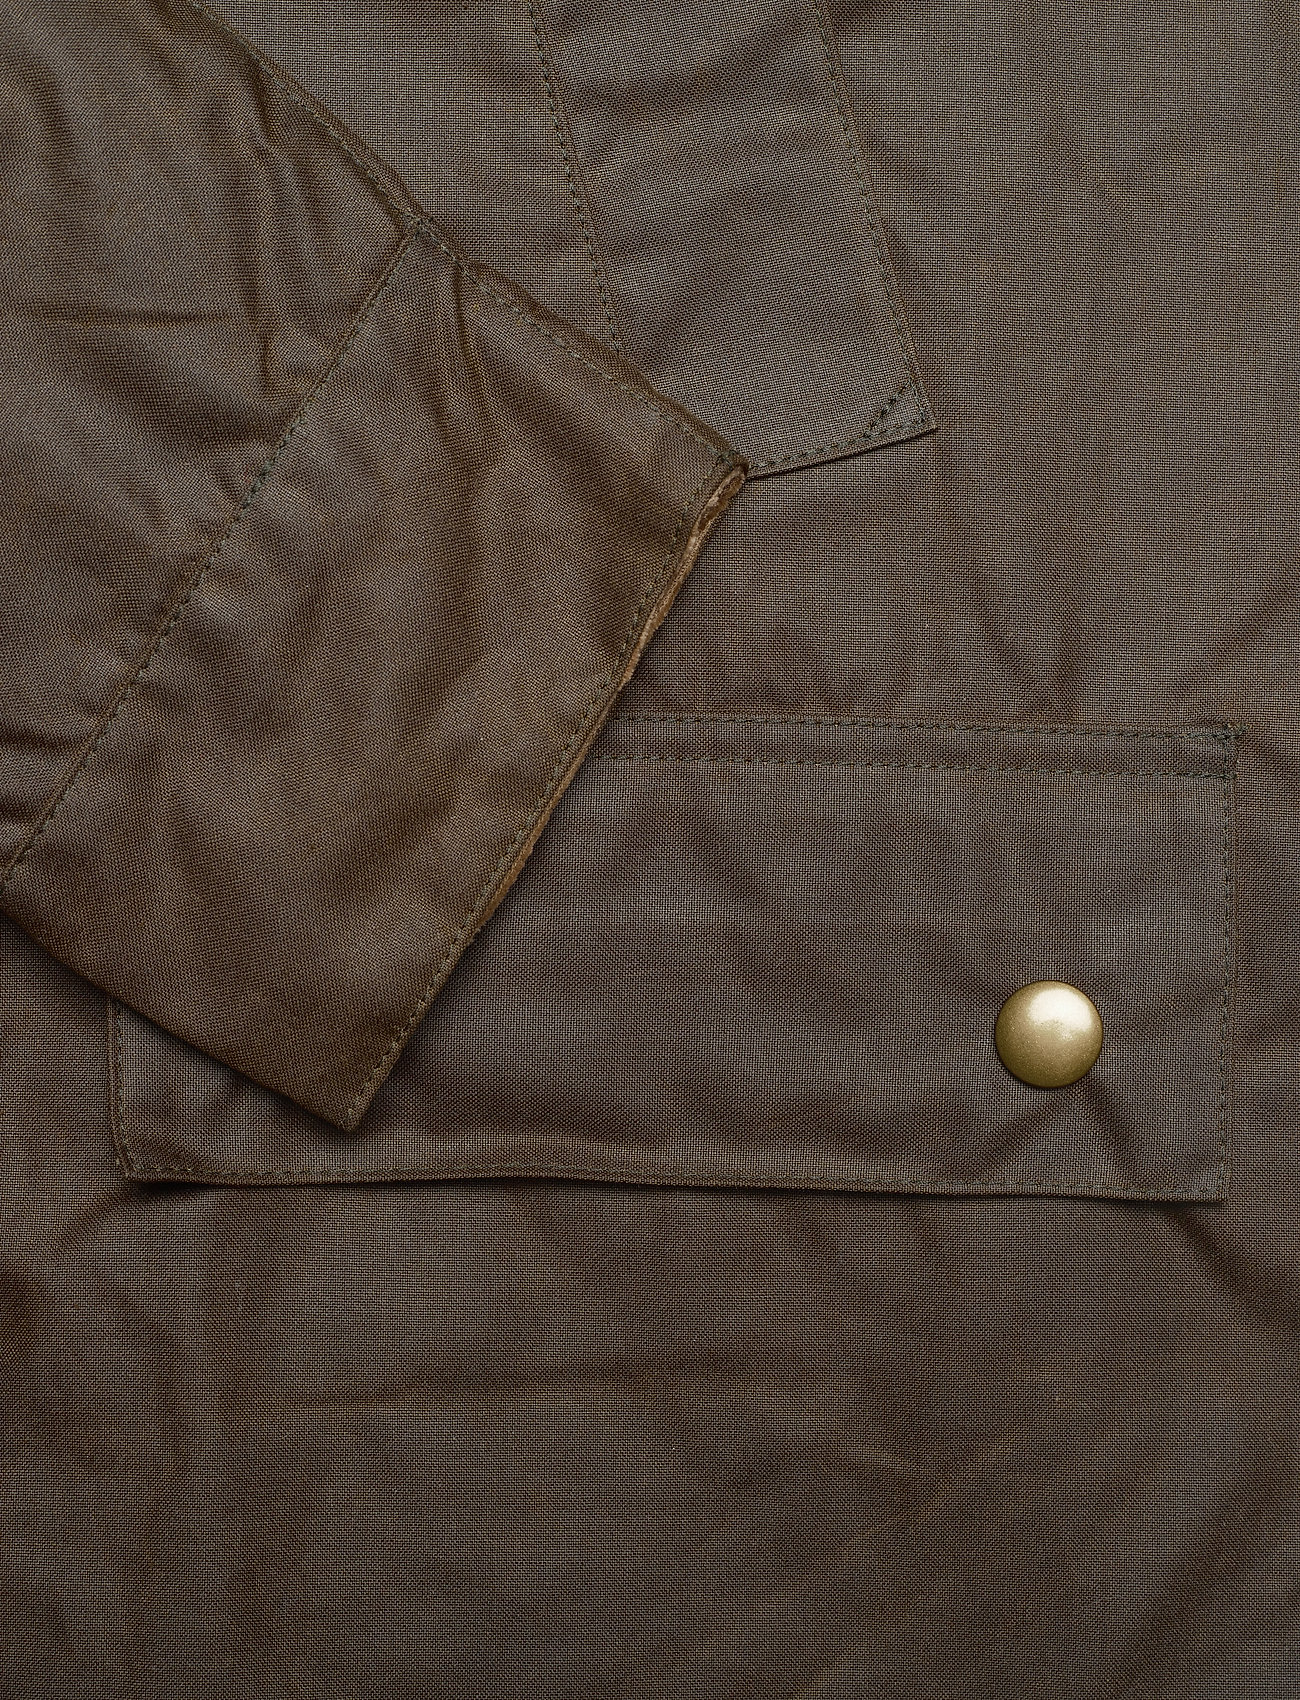 Brixtol Textiles - Buddy - kurtki-wiosenne - light olive - 7